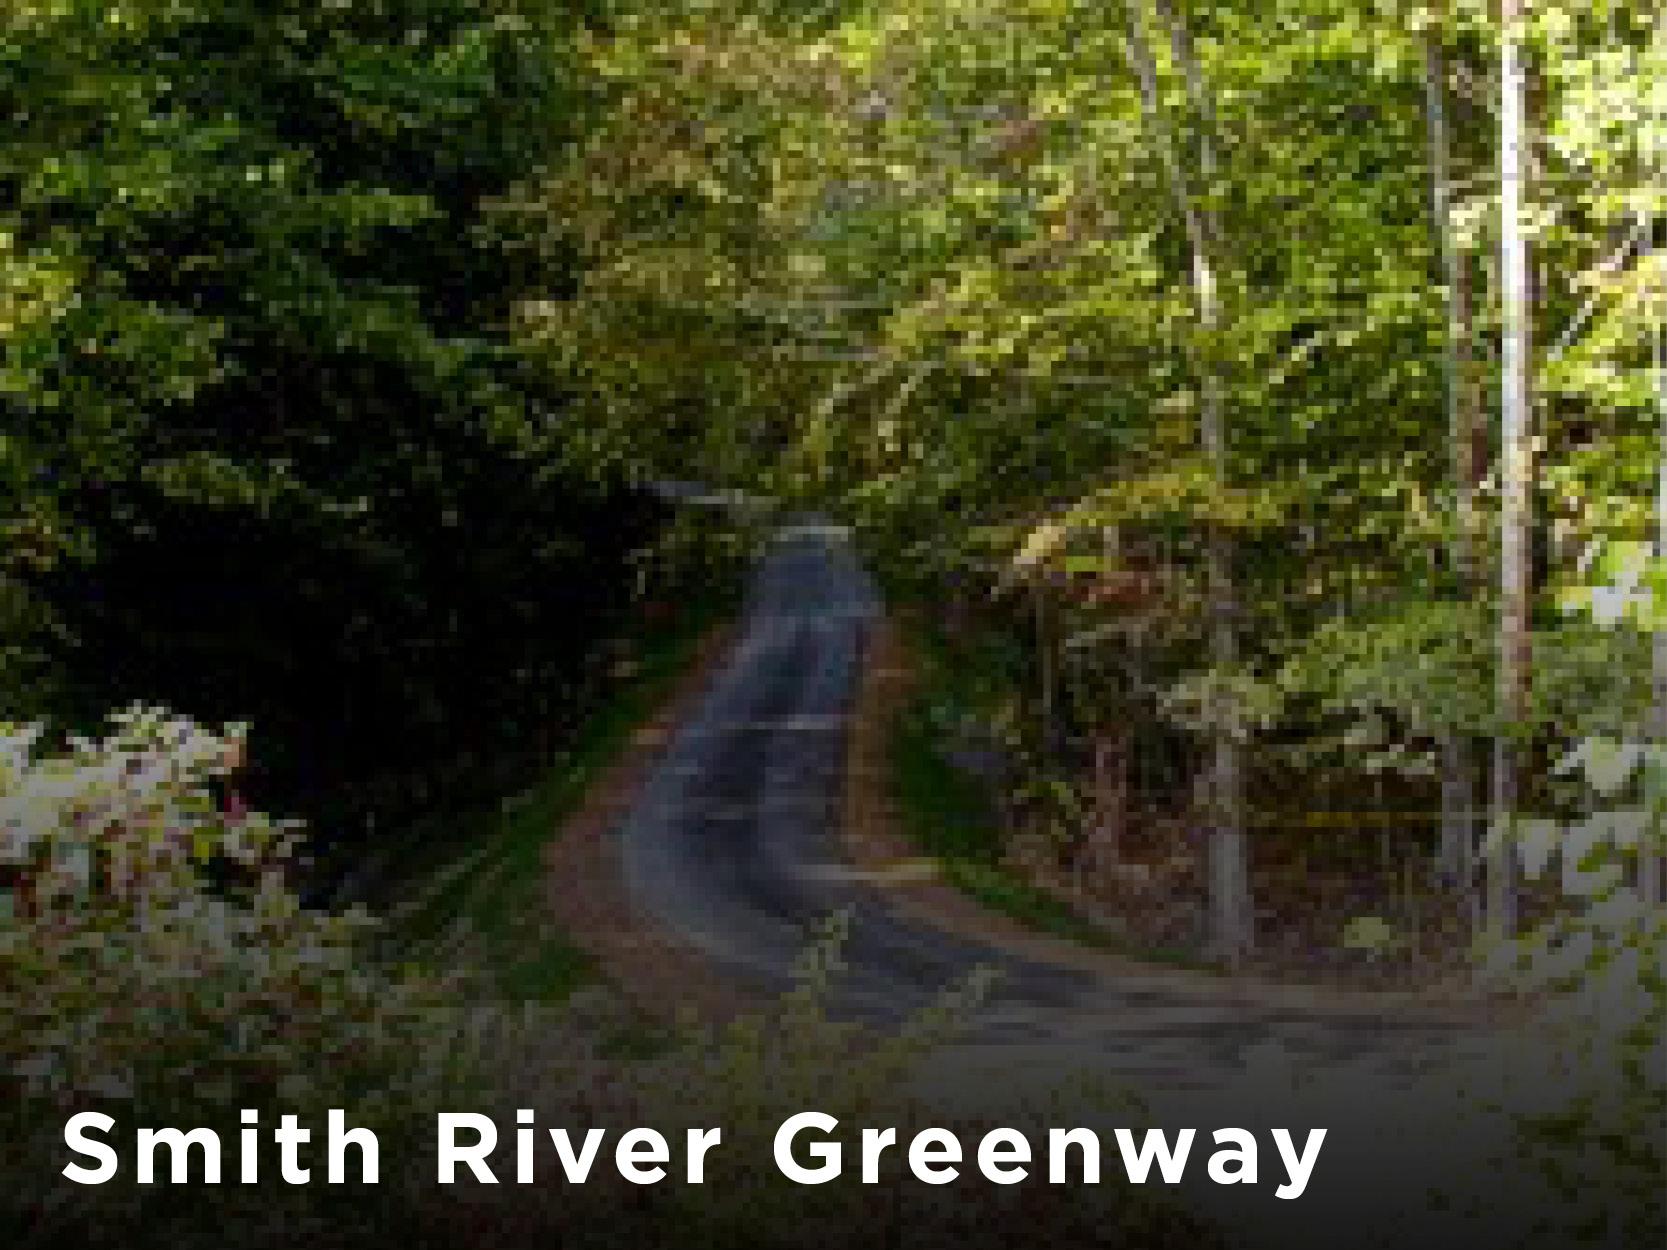 Smith River Greenway